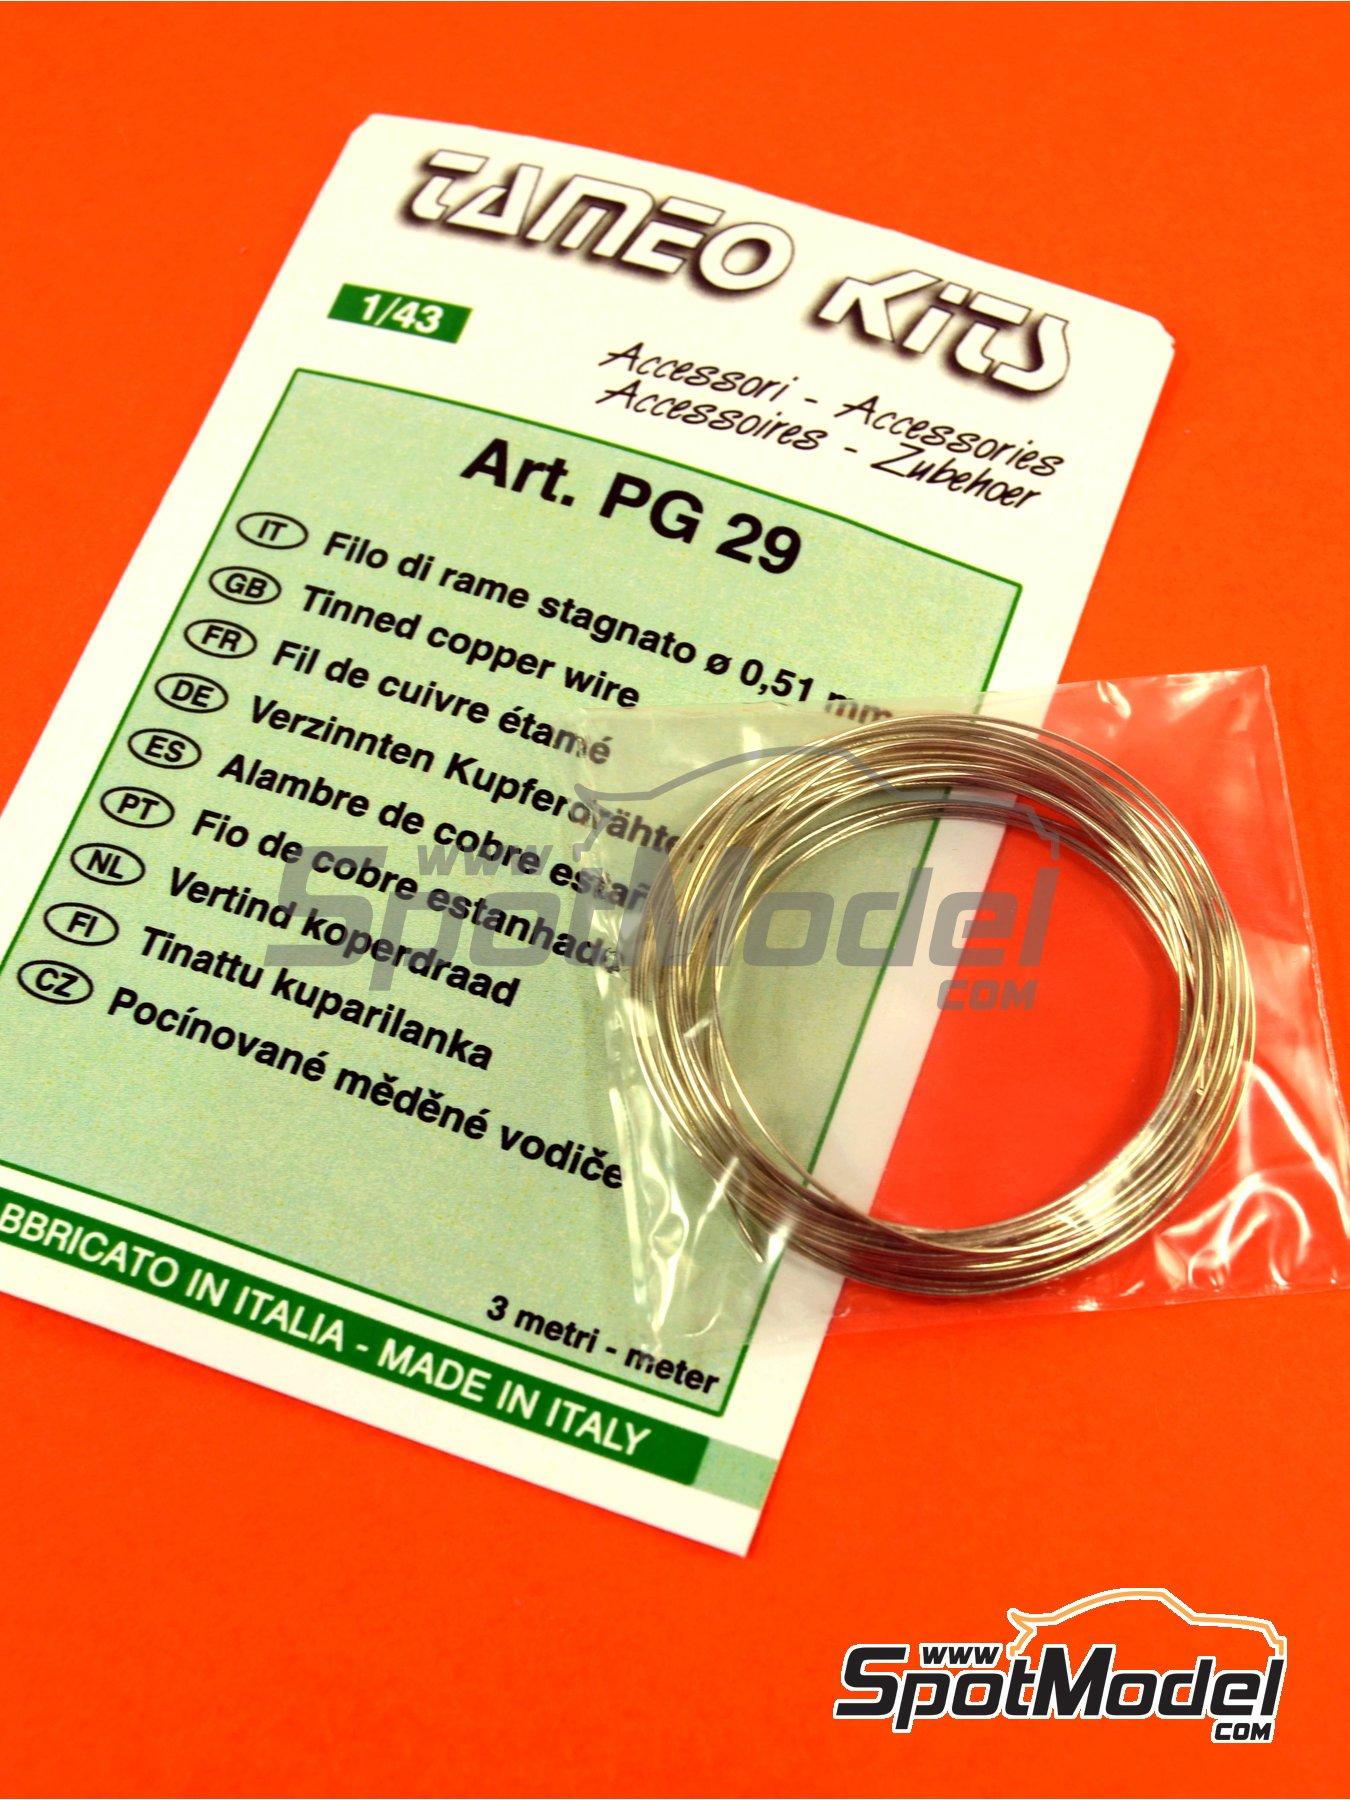 Alambre de cobre estañado de 0,51 milimetros de diametro | Material fabricado por Tameo Kits (ref.PG29) image